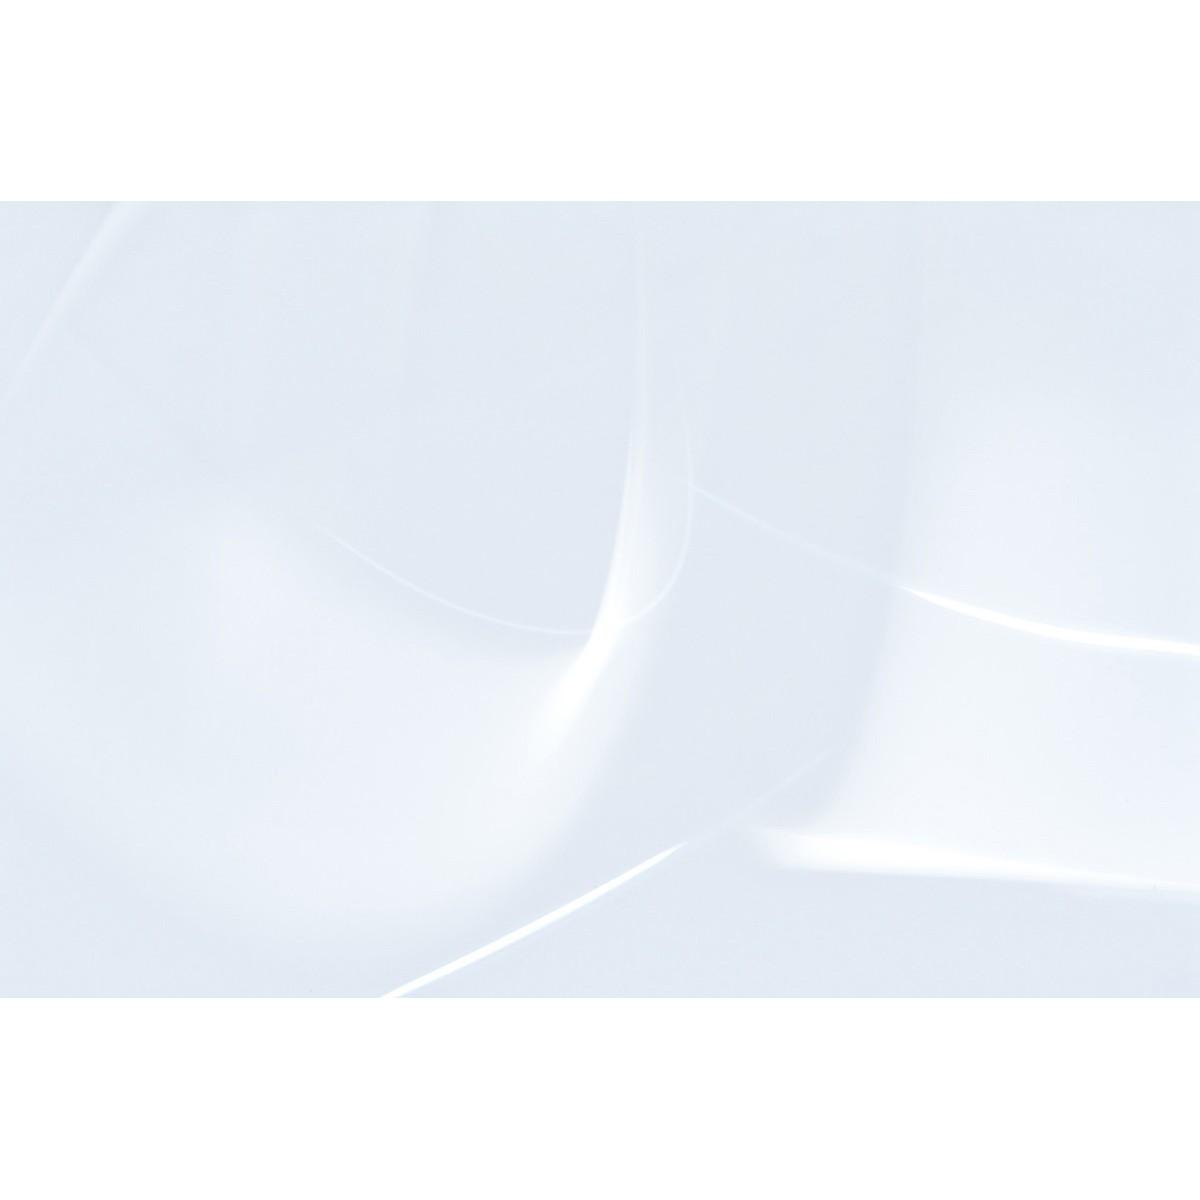 Libertad 6 - Luces